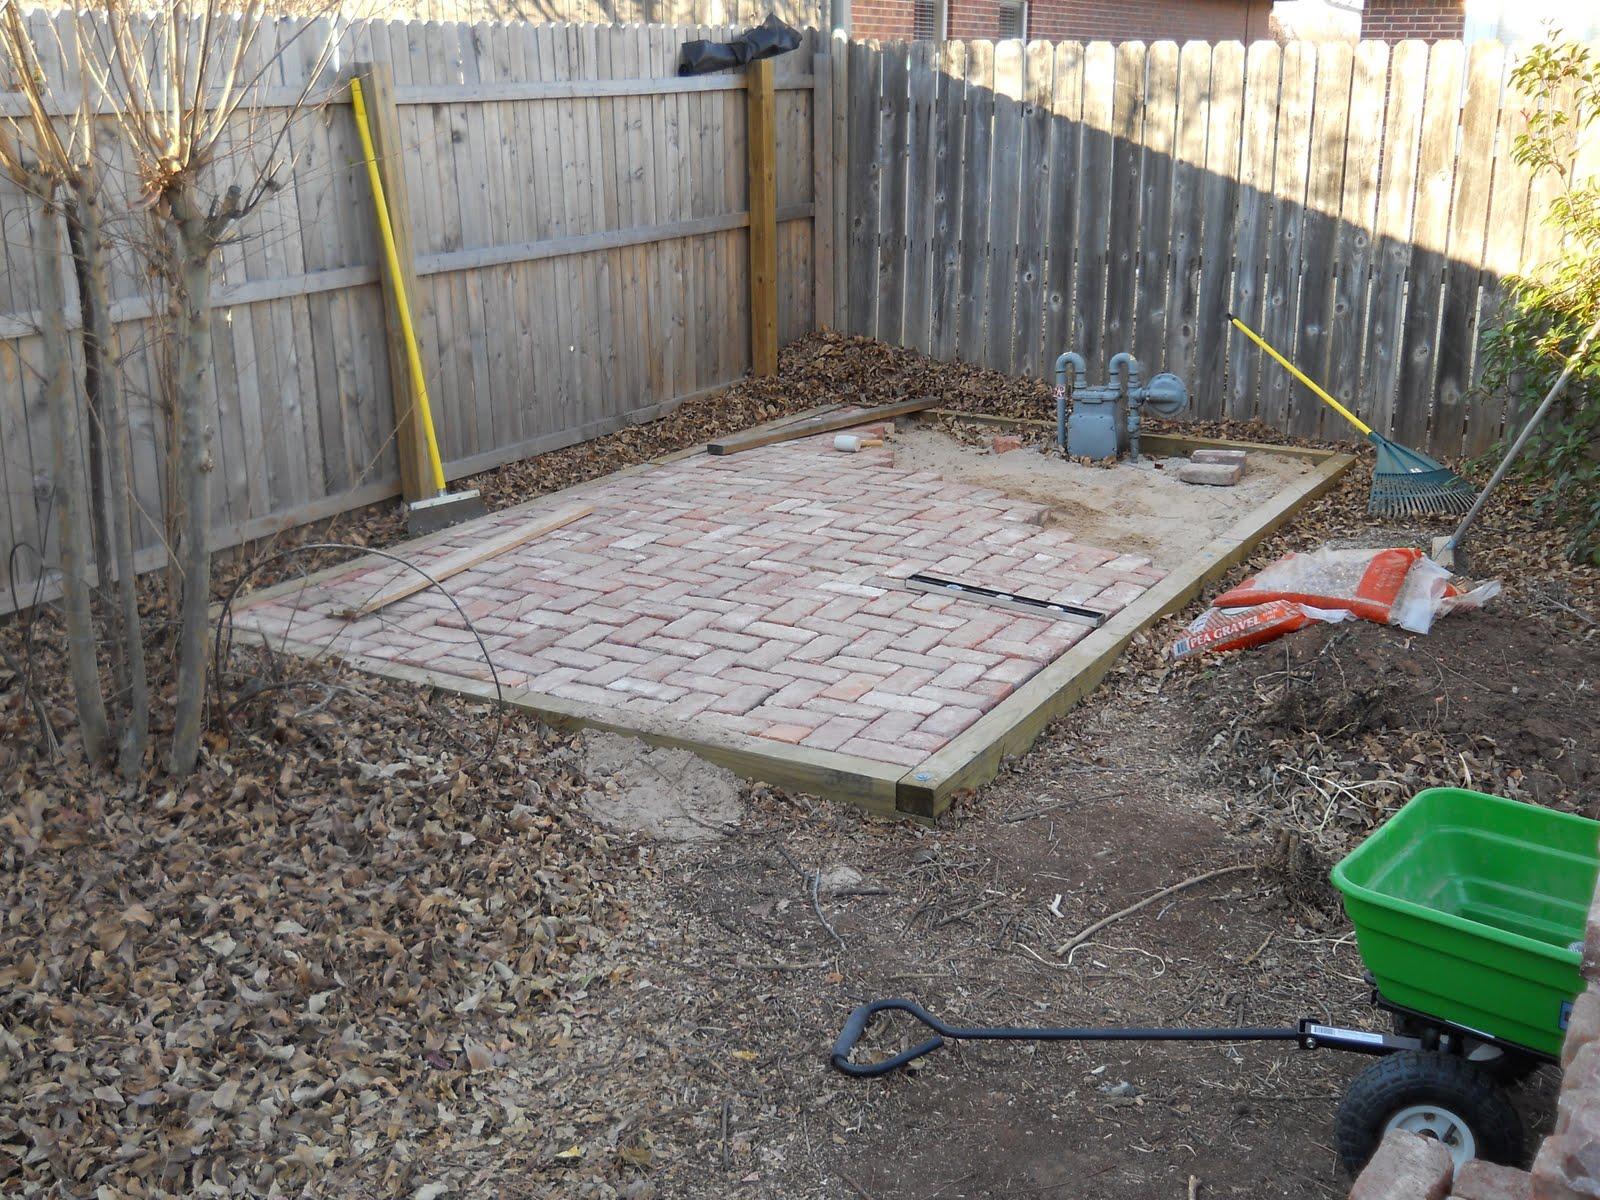 Oklahoma Projects Around The House: DIY Brick Patio on Backyard Brick Patio id=97854